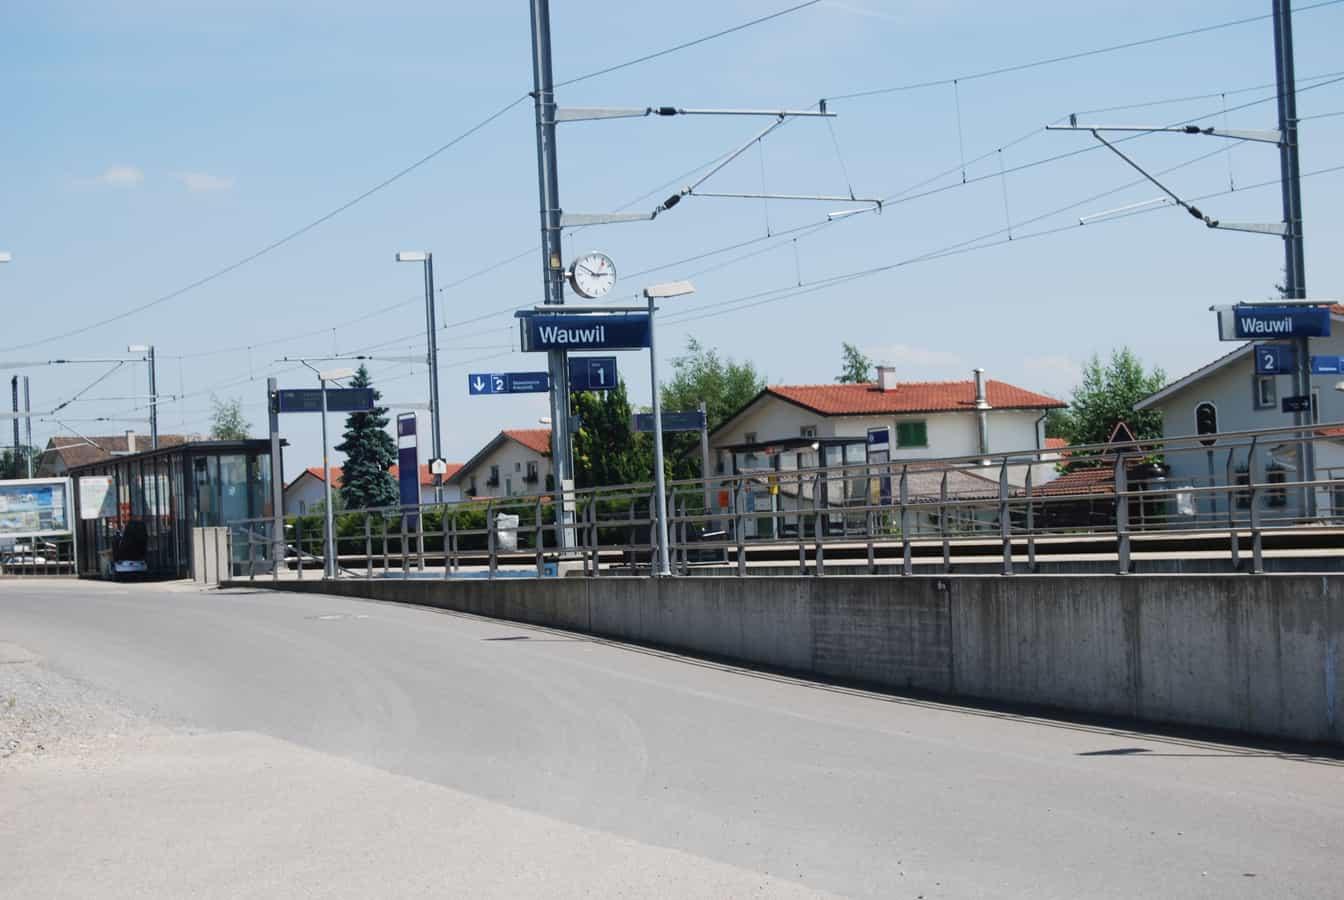 Bahnhof Wauwil